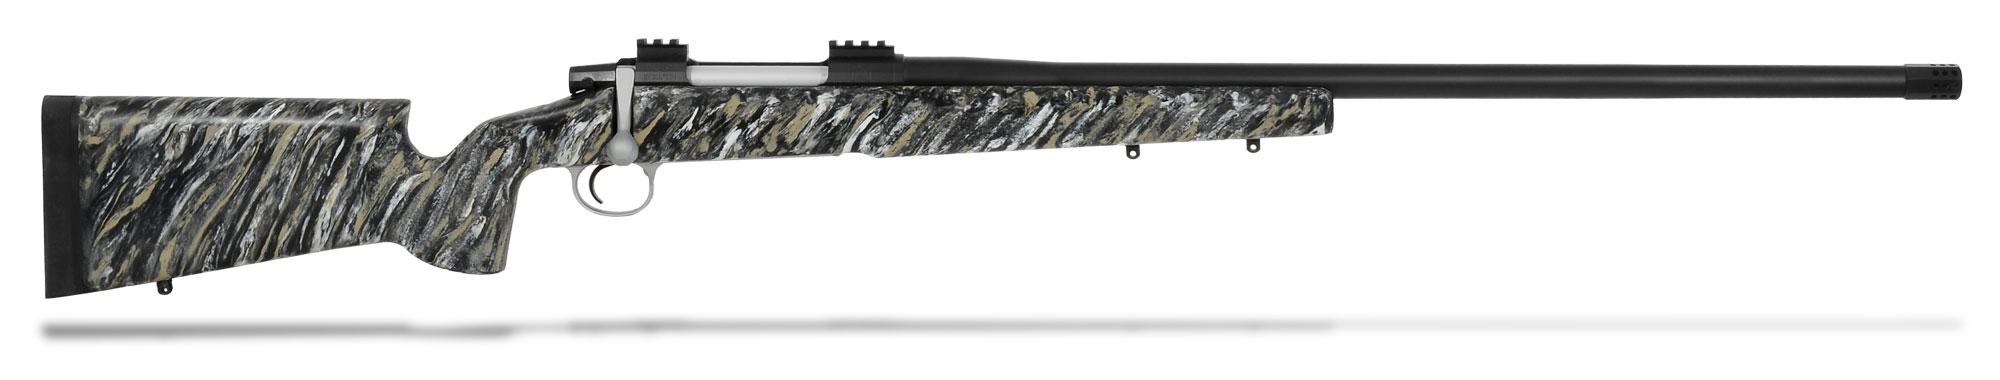 MOA Evolution Long Range Hunter 7mm Remington Magnum Rifle